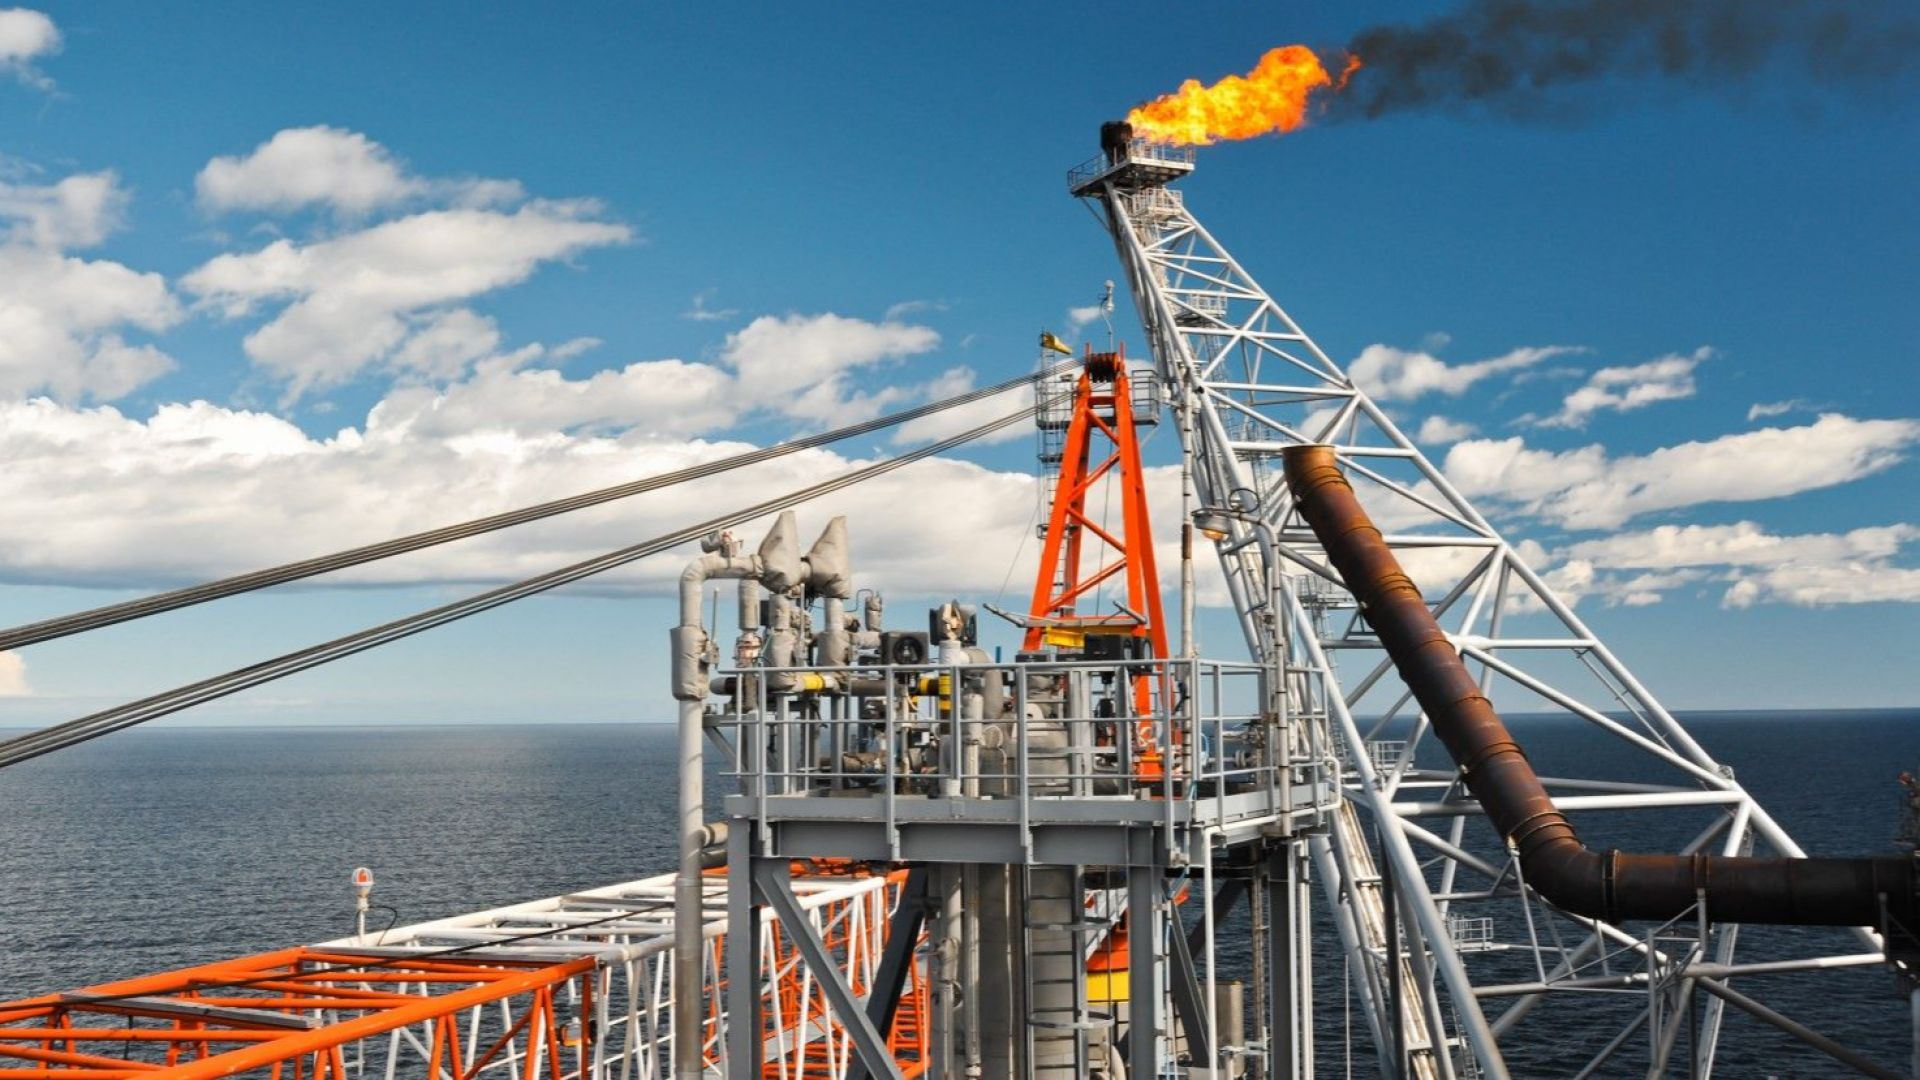 Страните от ОПЕК+ договориха рекордно намаление на добива на петрол с 9,7 млн. барела на ден